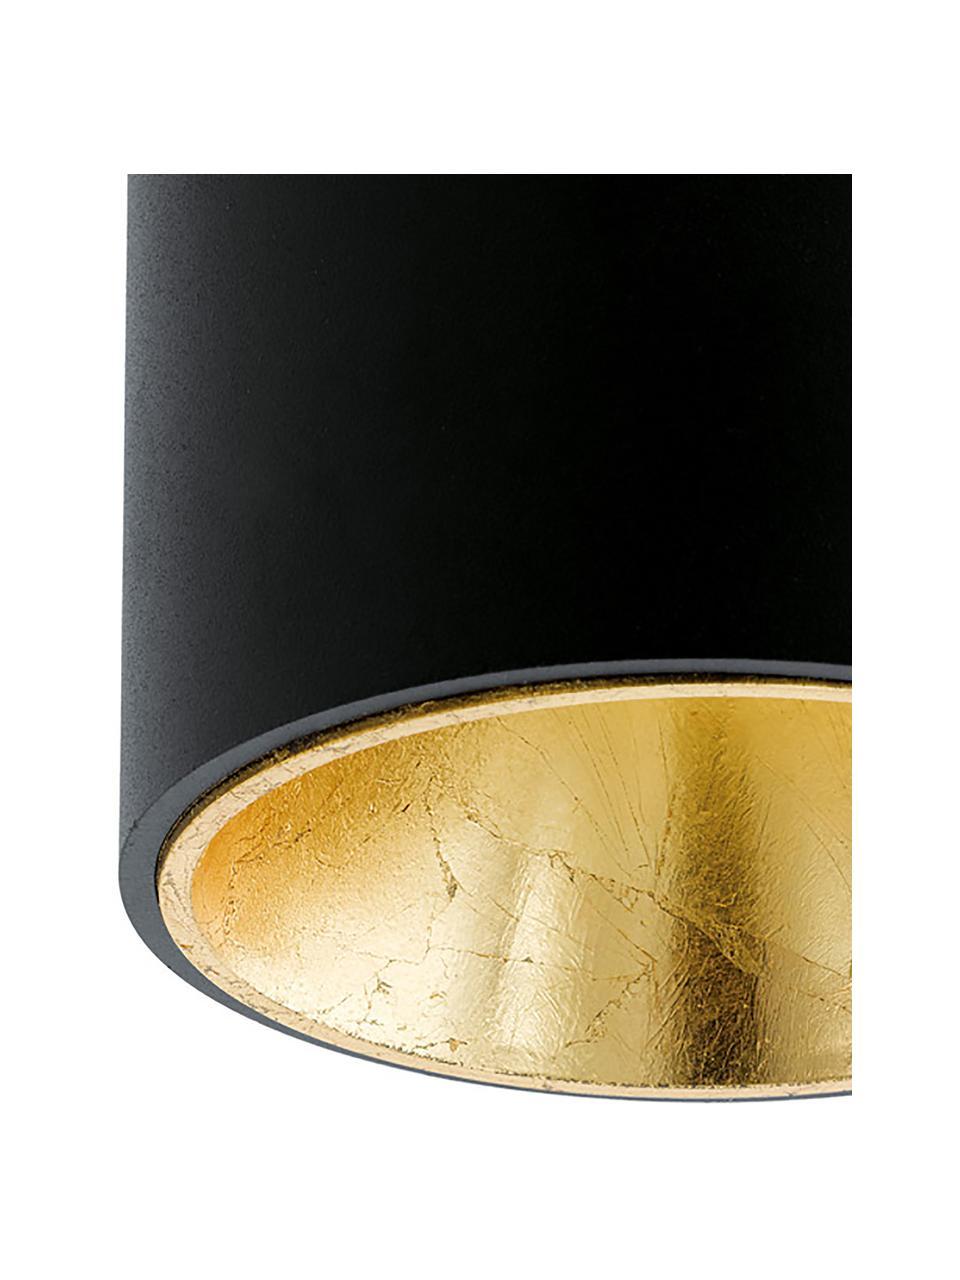 LED plafondspot Marty, Zwart, goudkleurig, Ø 10 x H 12 cm